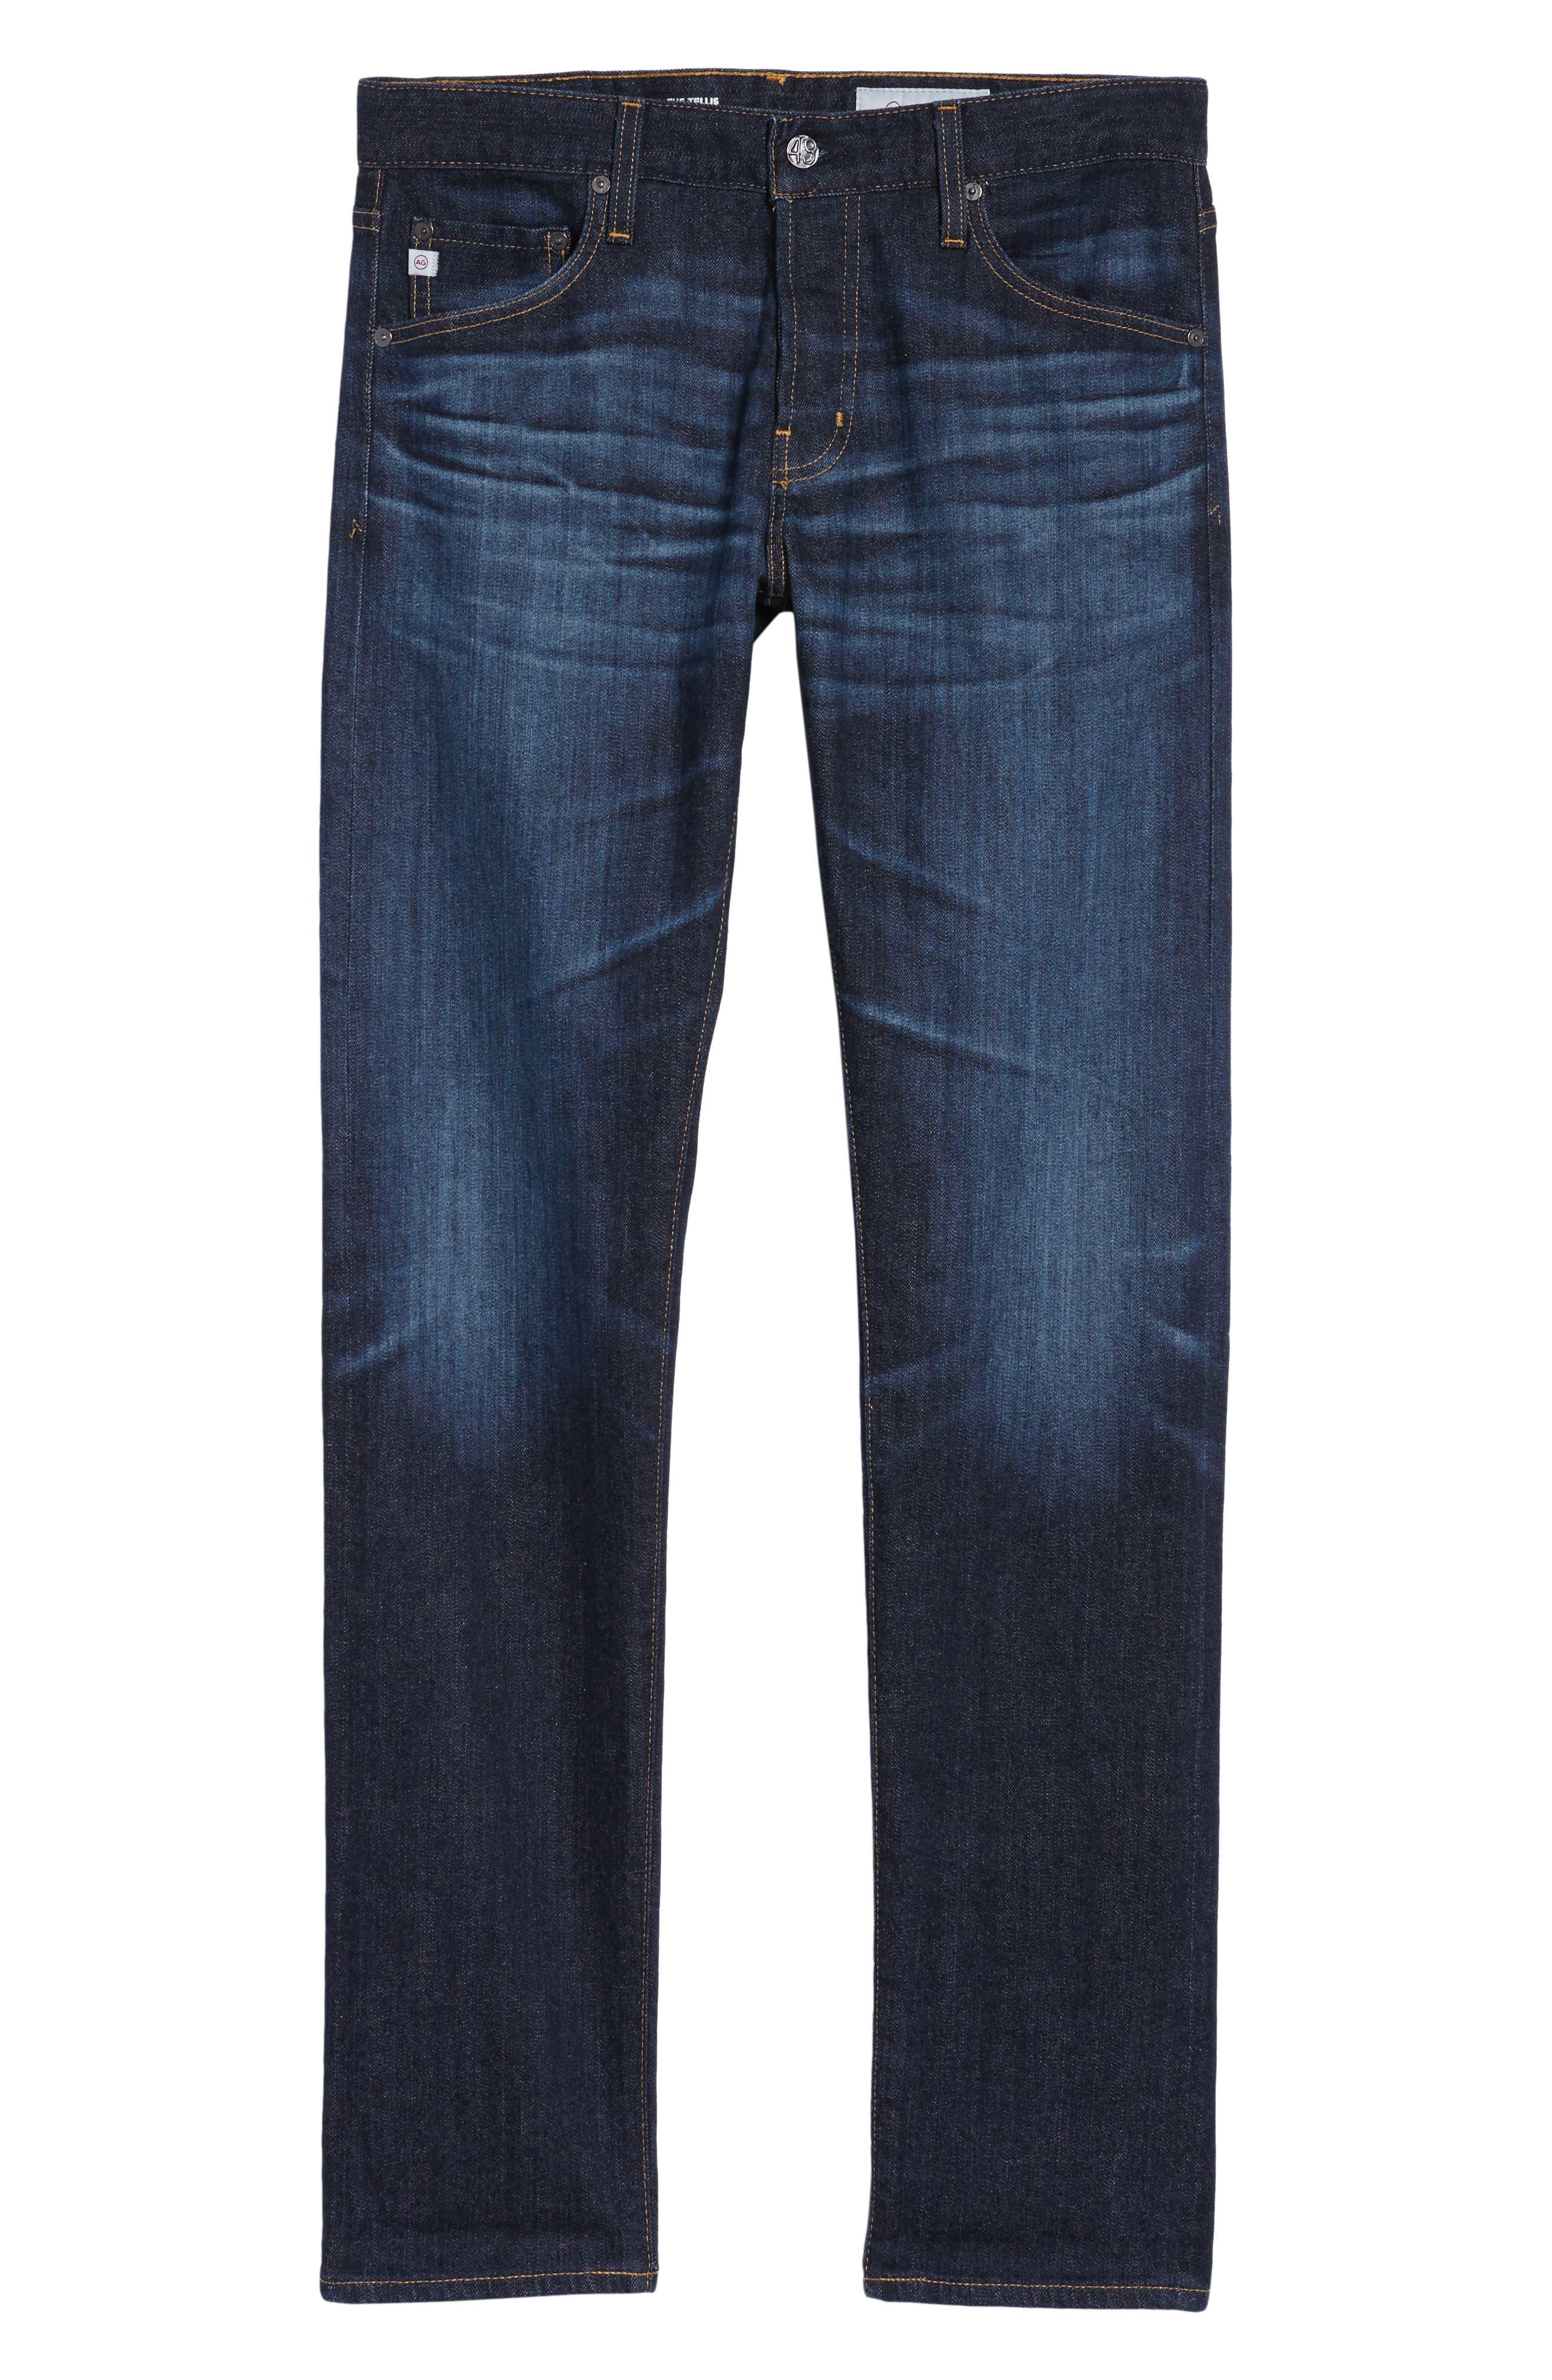 Tellis Slim Fit Jeans,                             Alternate thumbnail 6, color,